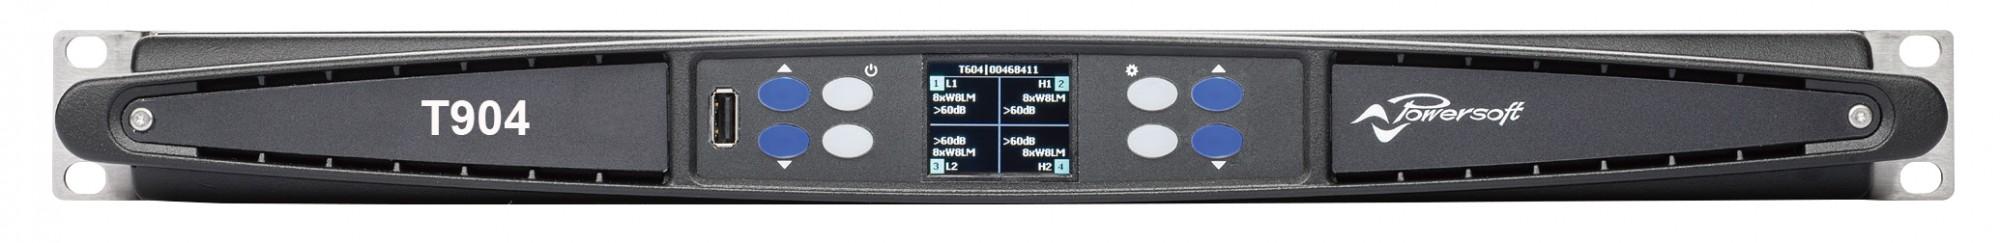 T904.jpg